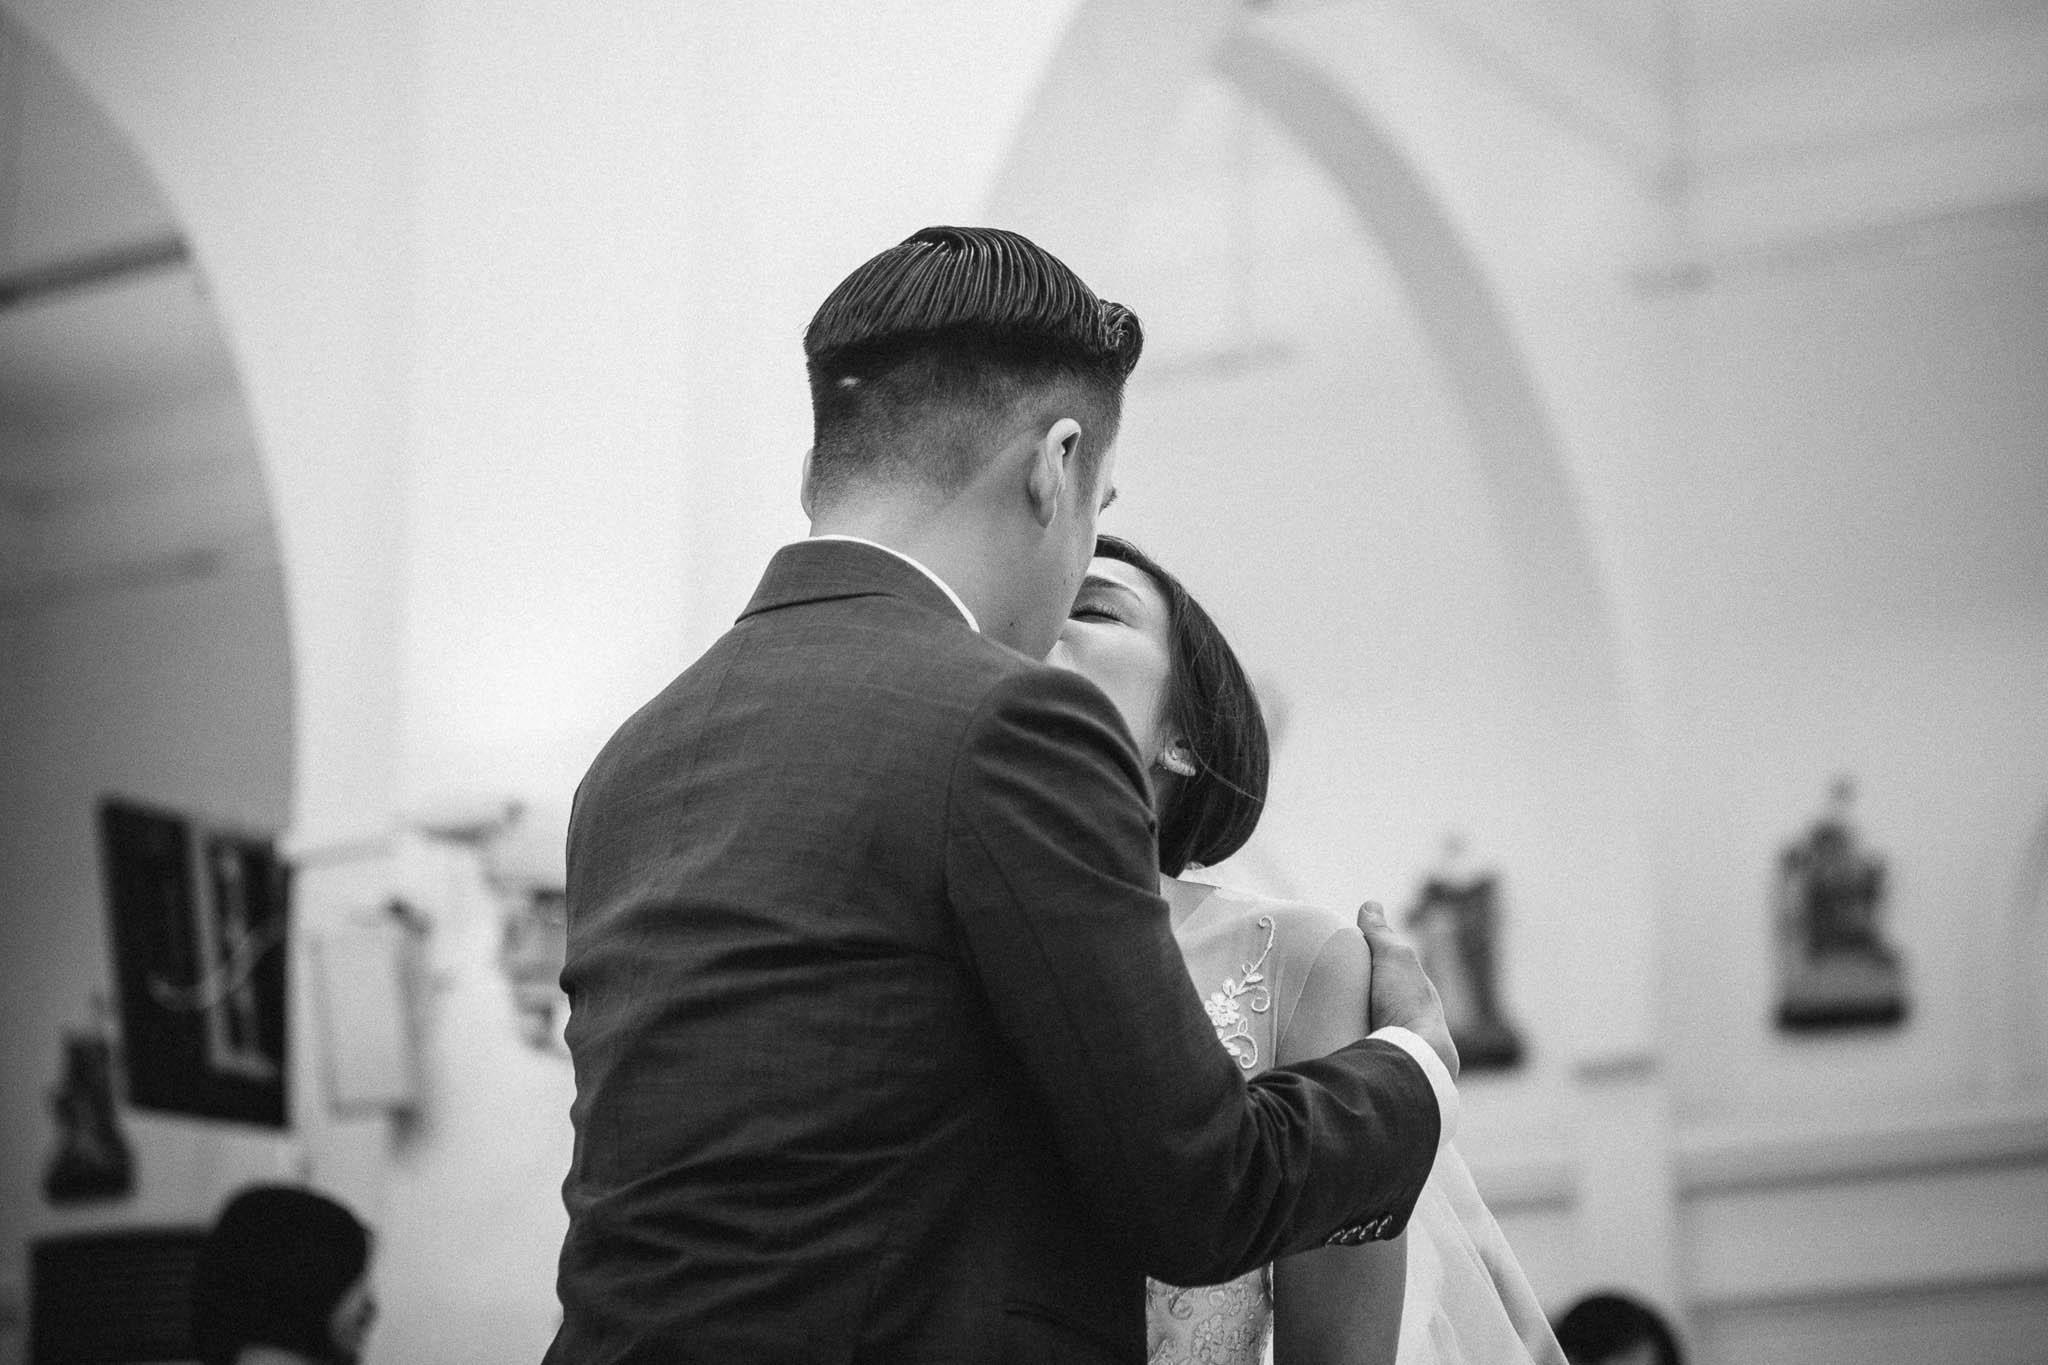 singapore-wedding-photographer-malay-indian-pre-wedding-travel-wmt-2015-jeremy-larissa-44.jpg